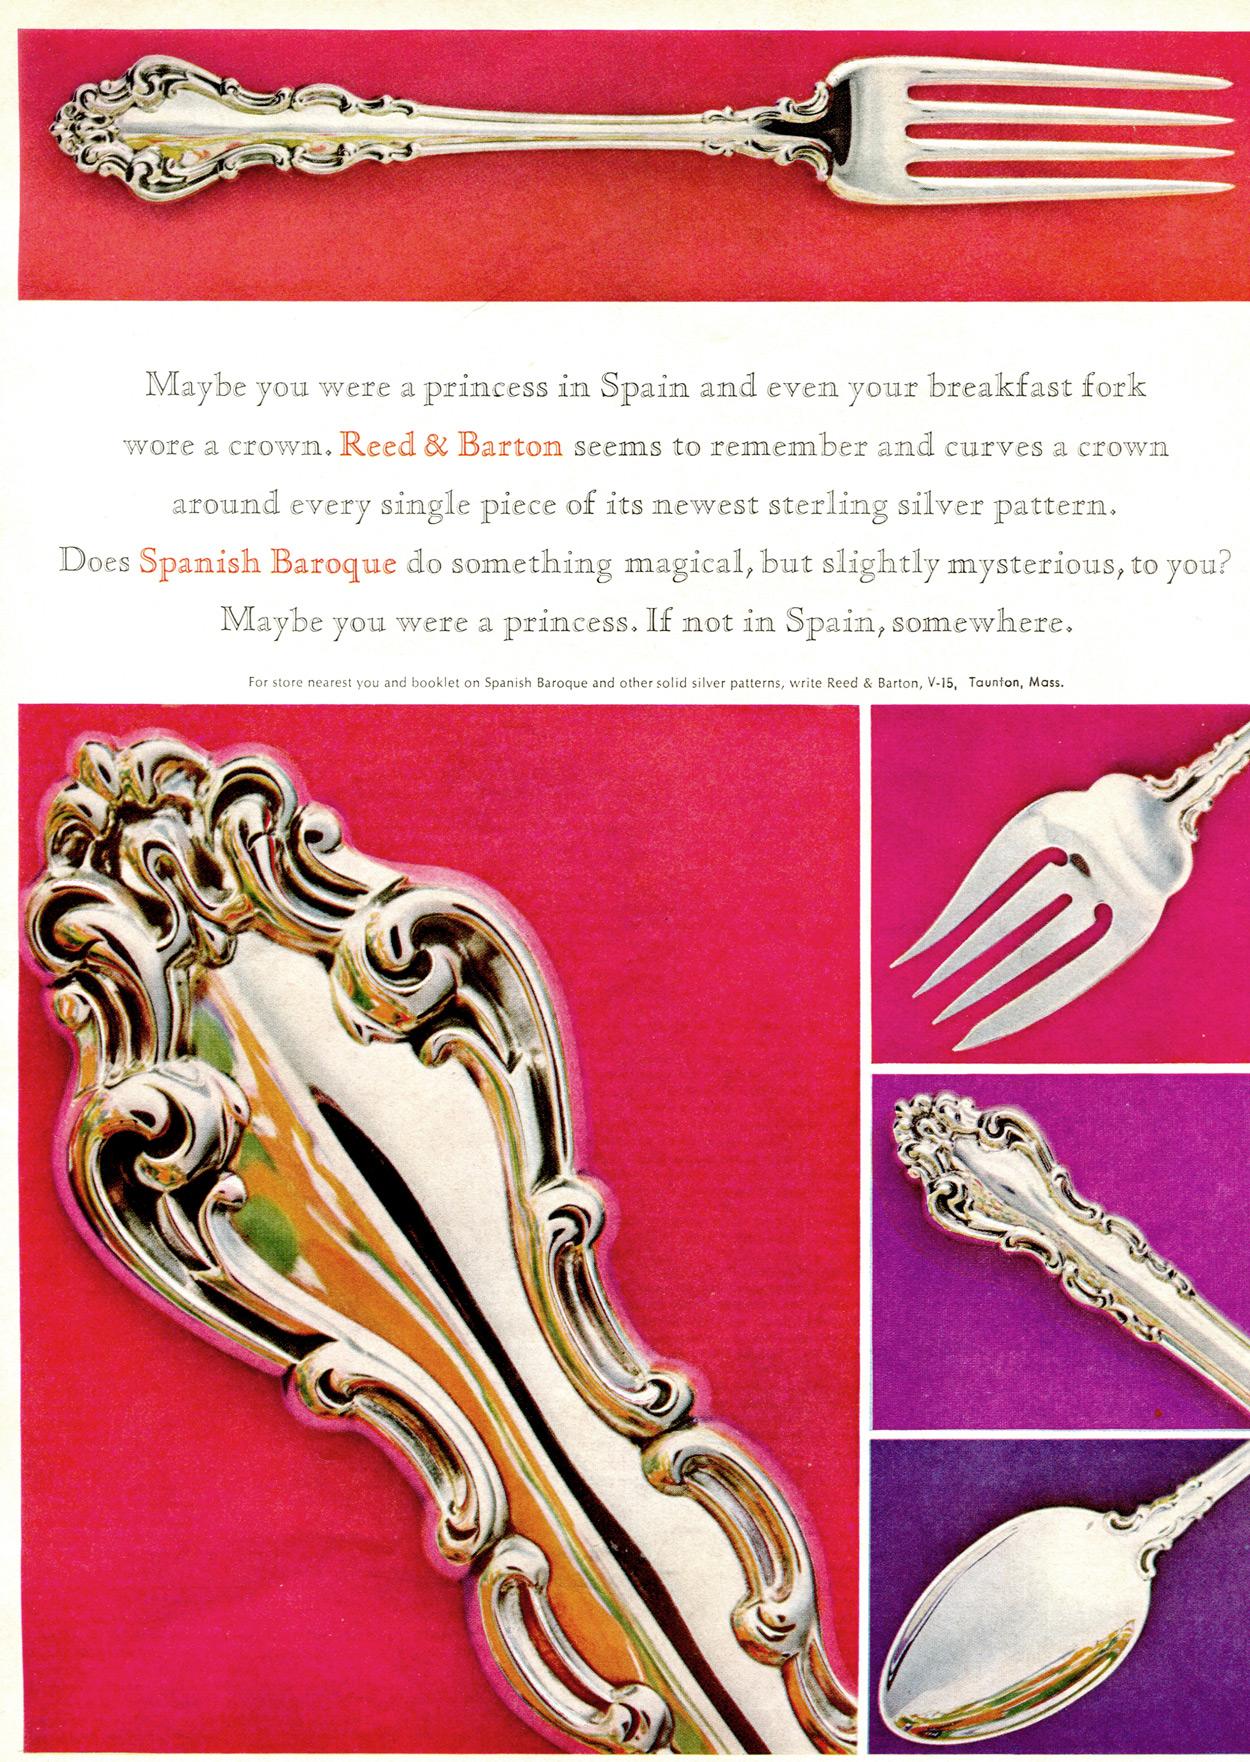 Spanish Baroque 1960s ad Silver